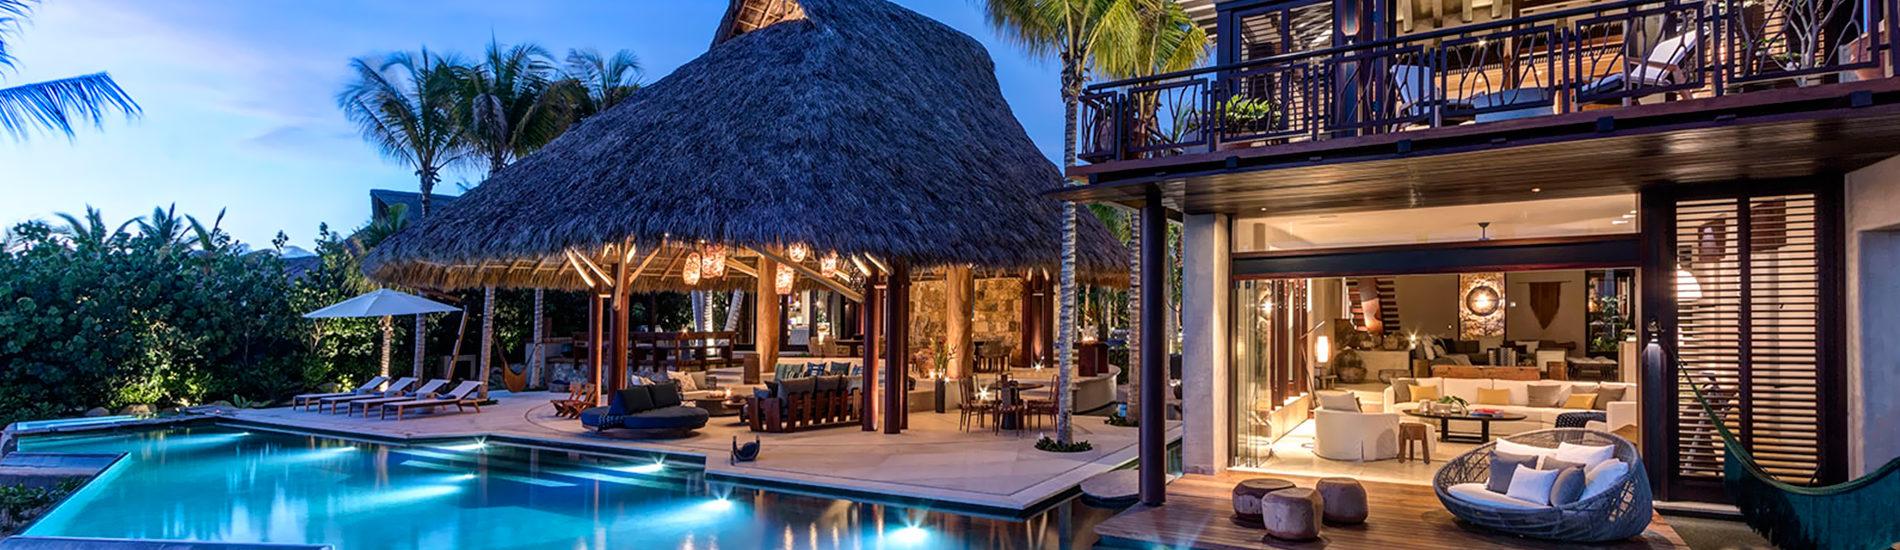 casa koko - punta mita | journey mexico